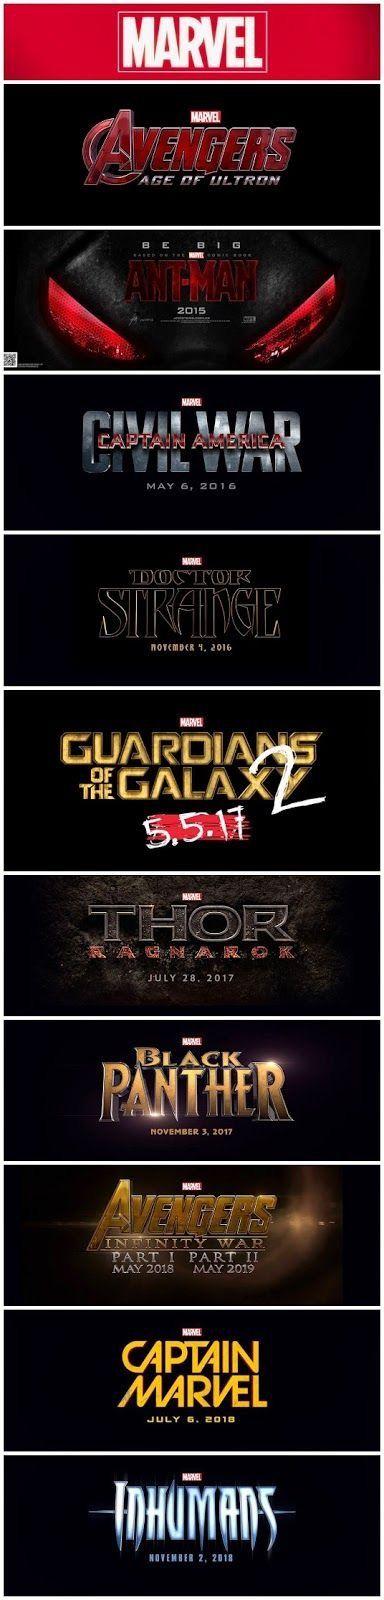 Still no Loki movie, Black Widow  movie, Hawkeye movie or Budapest movie